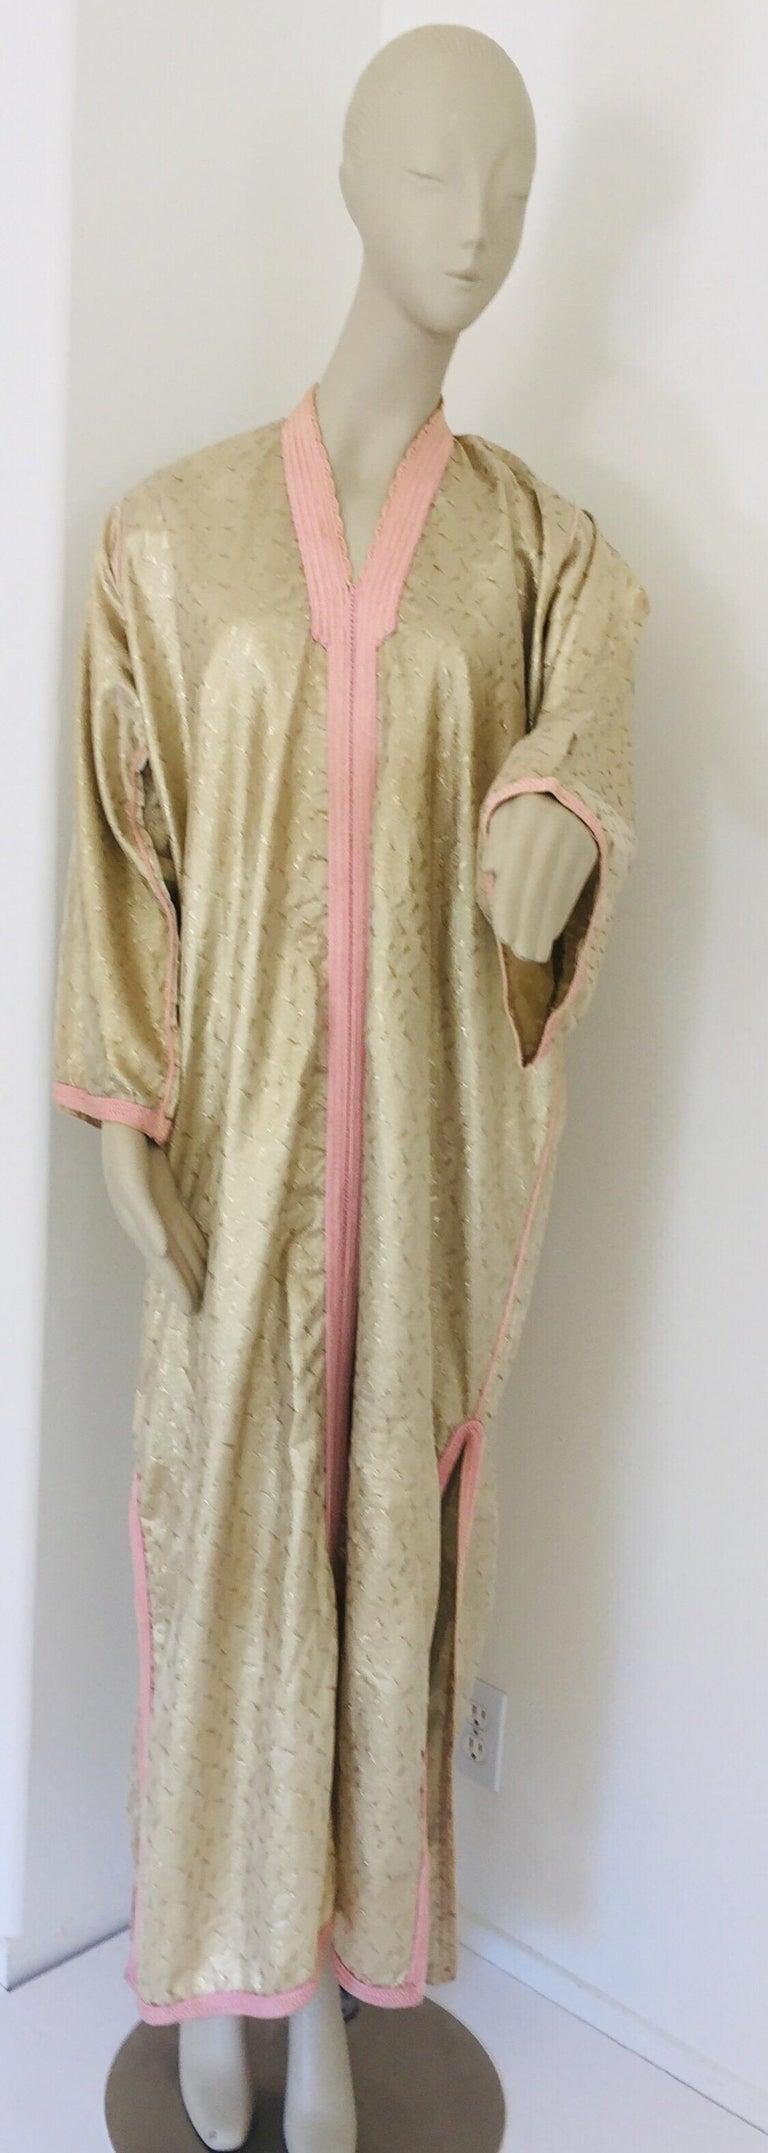 Bohemian 1970s Metallic Gold Moroccan Caftan, Kaftan Maxi Dress North Africa, Morocco For Sale